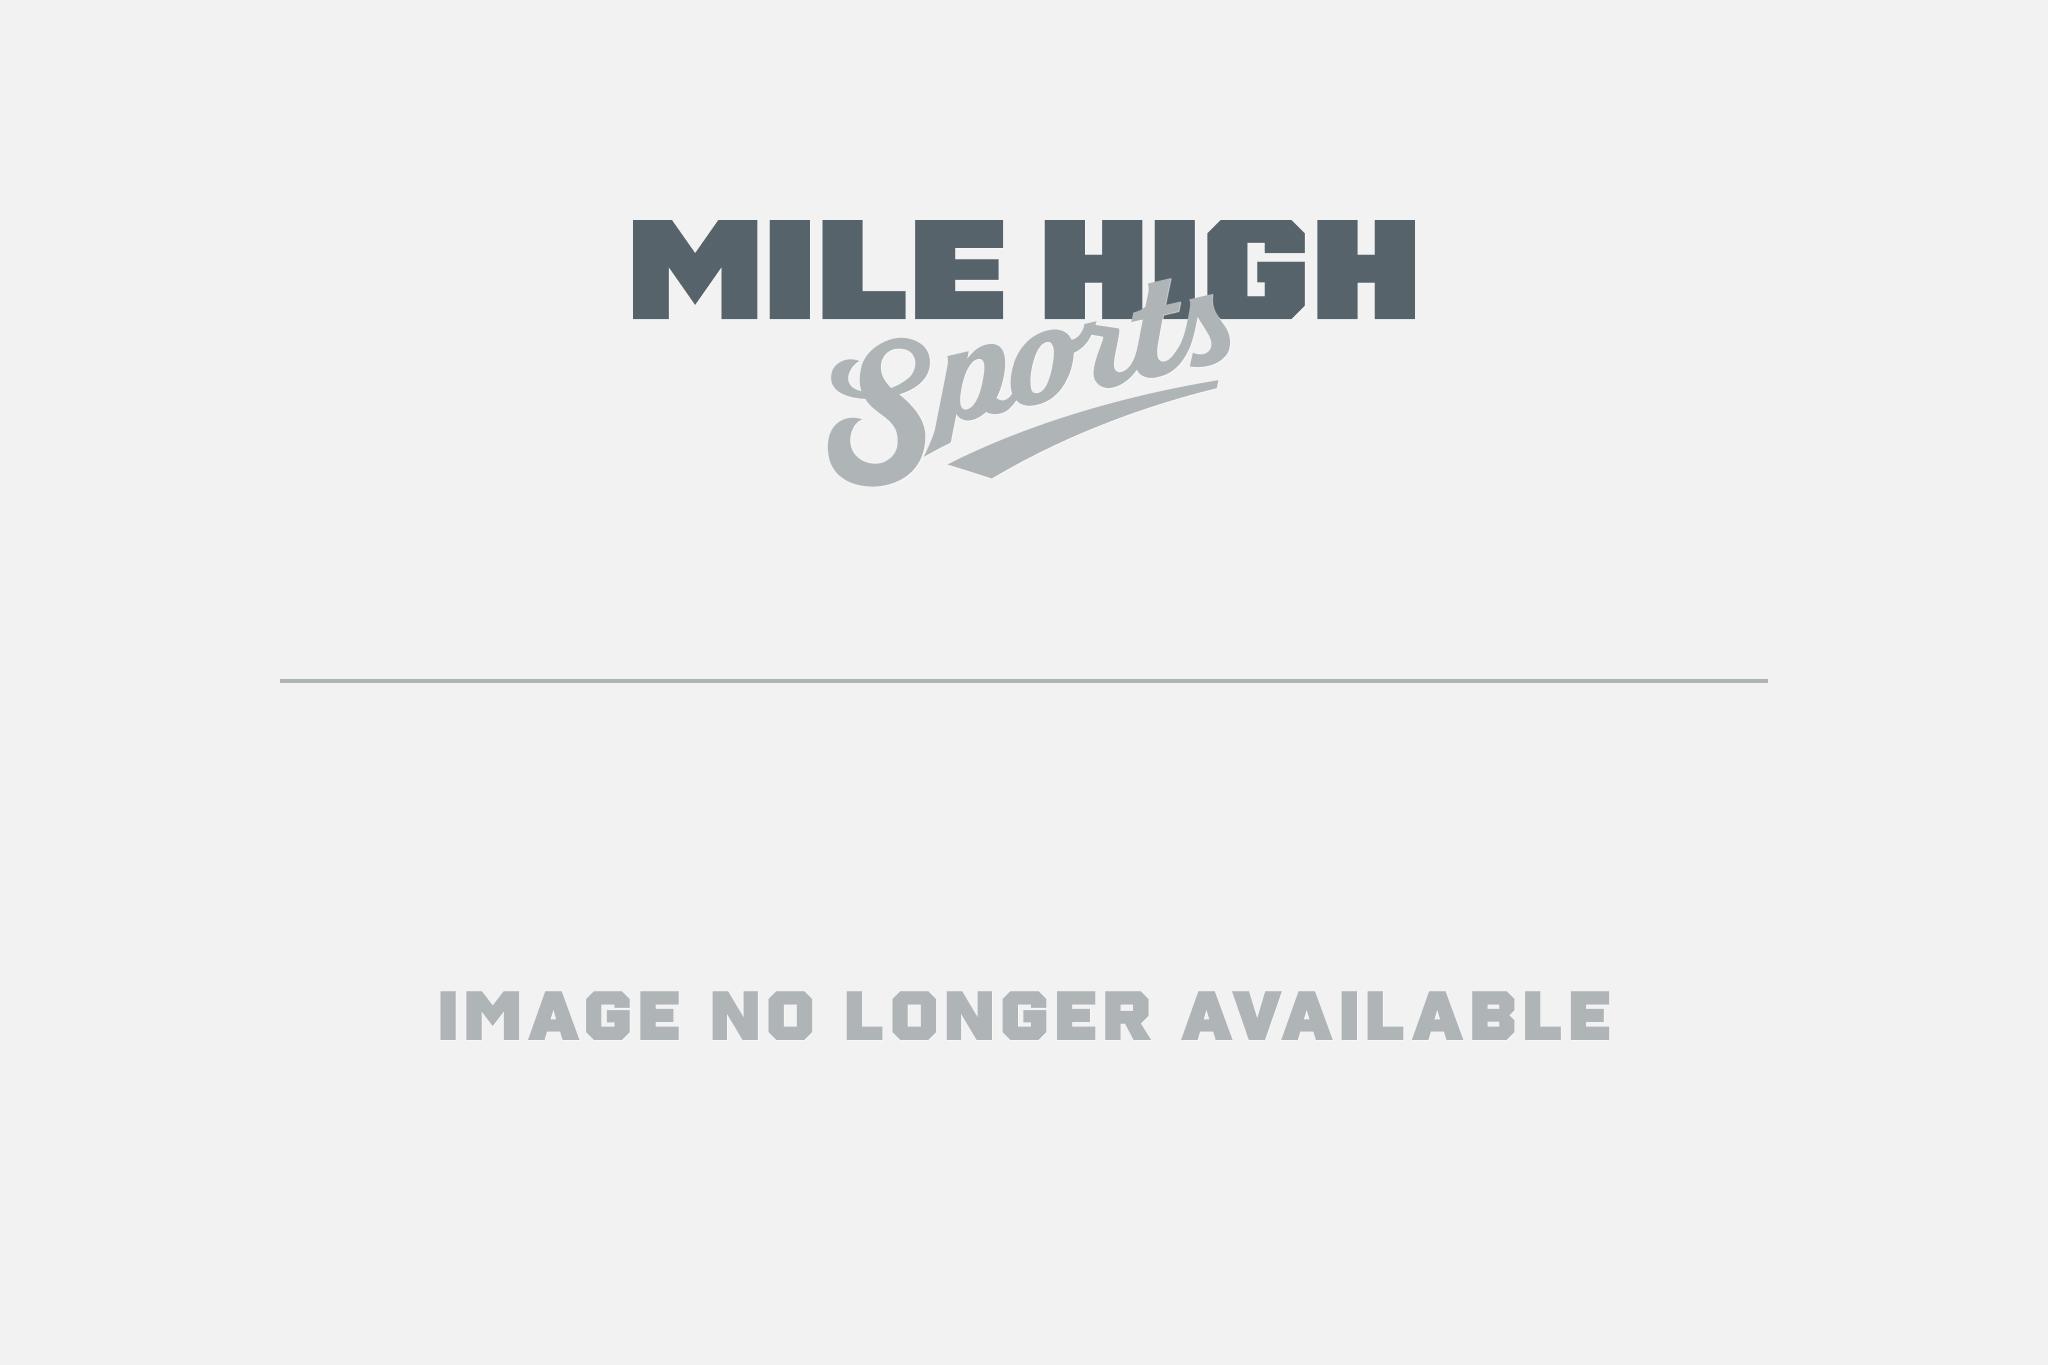 Credit: http://www.denverpioneers.com/sports/m-hockey/recaps/021817aad.html